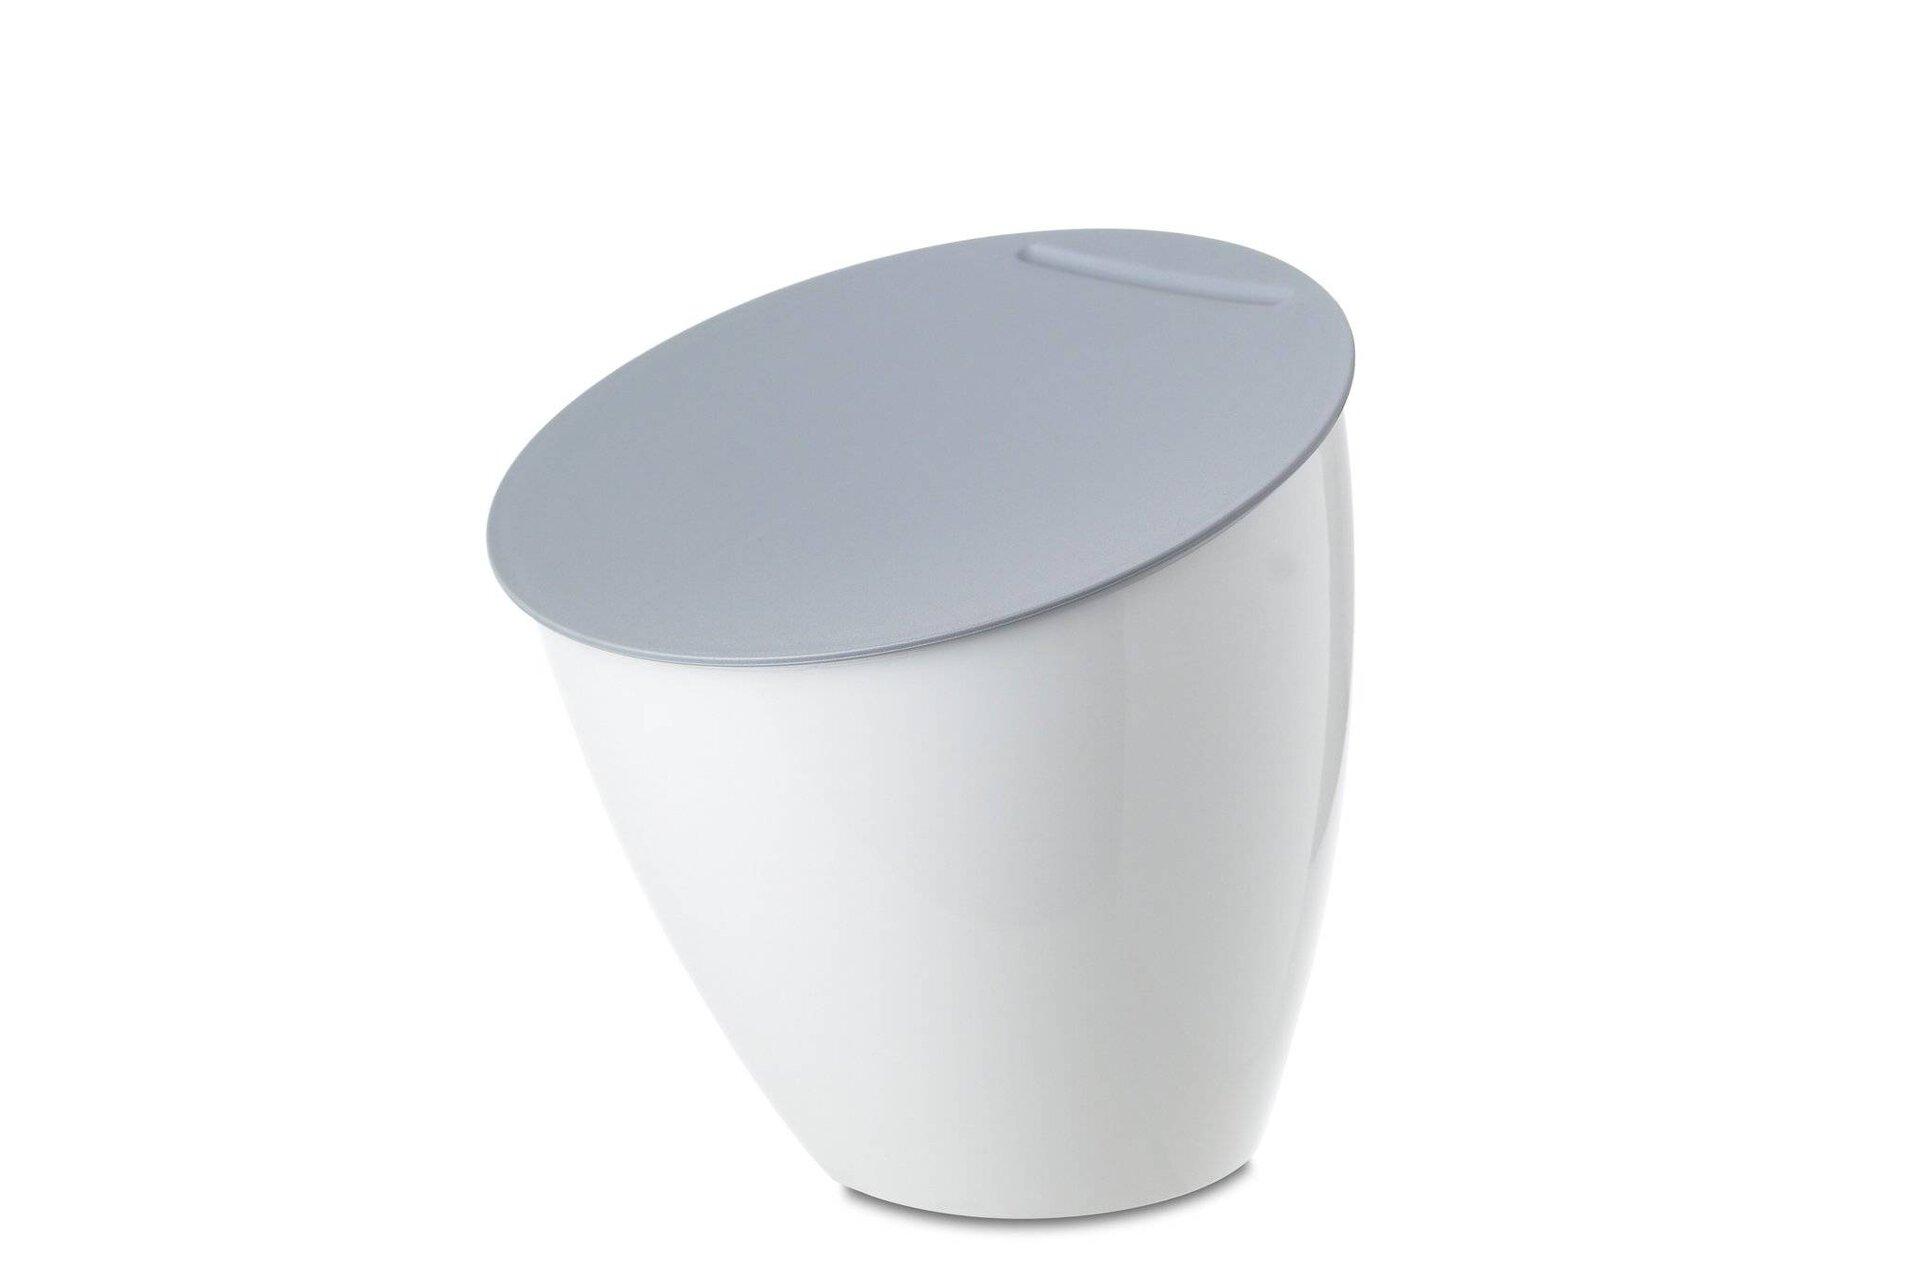 Müllbehälter calypso MEPAL Kunststoff weiß 17 x 18 x 17 cm